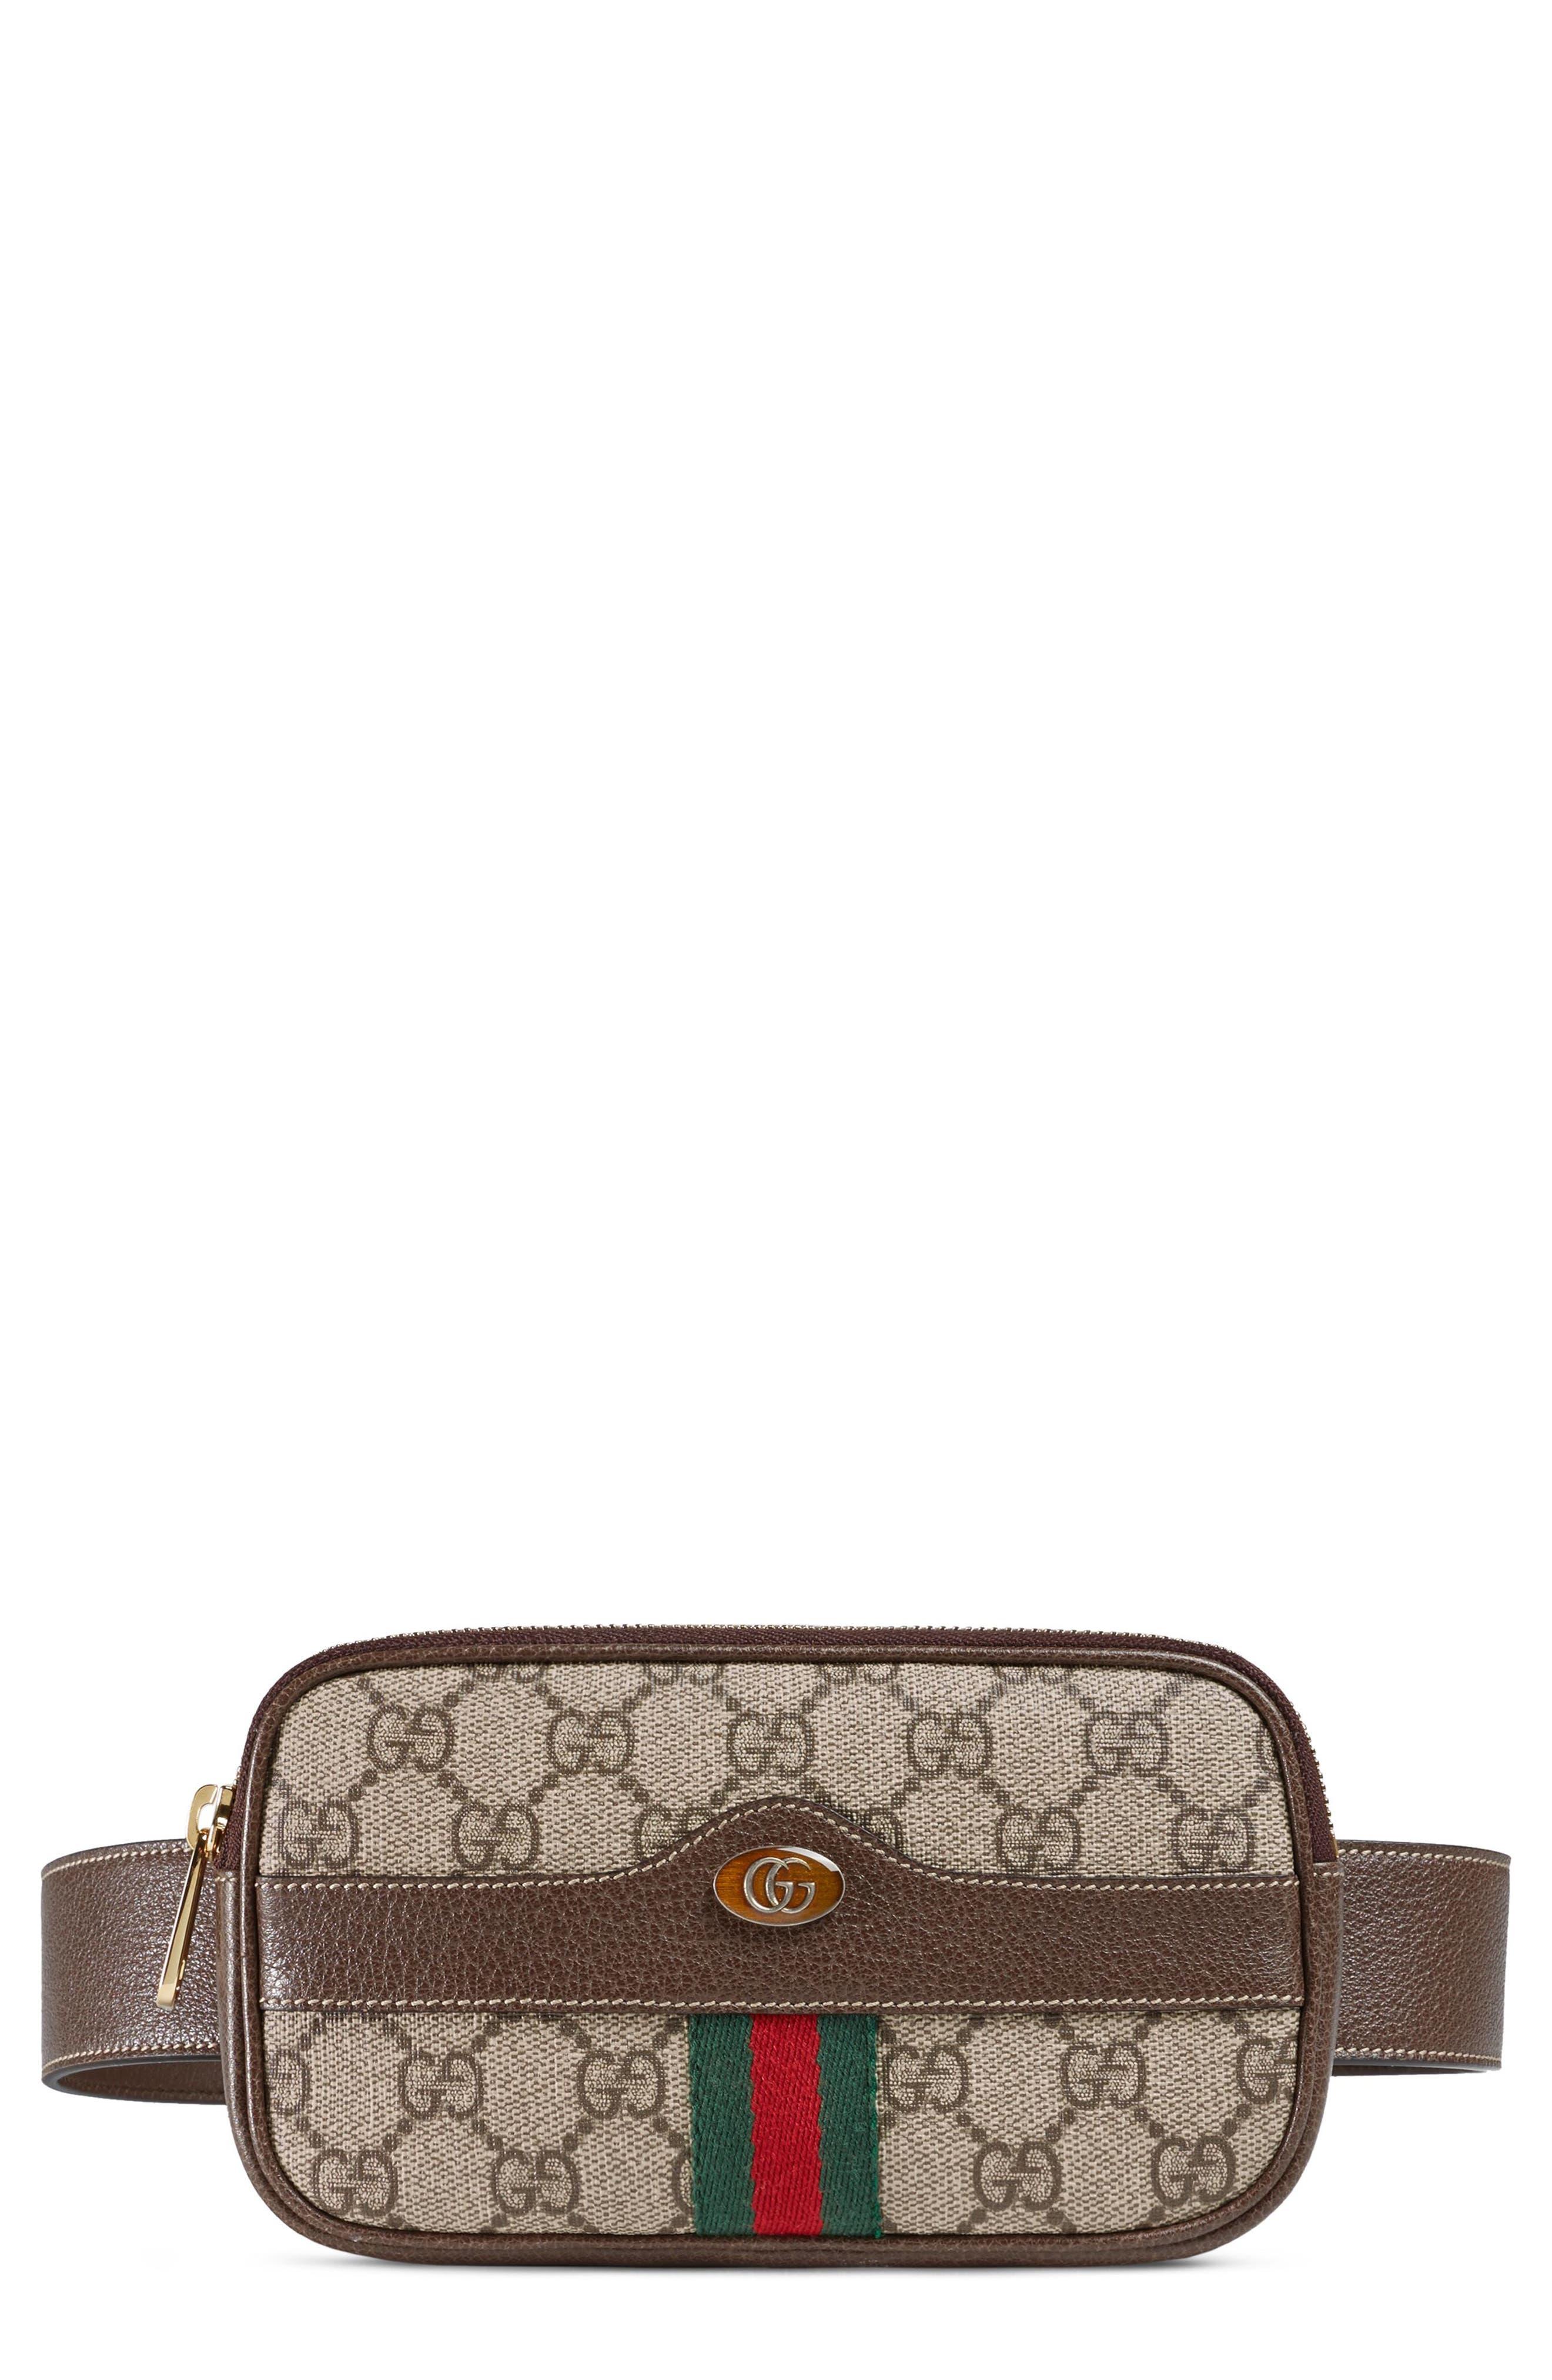 Gucci Ophidia GG Supreme Small Canvas Belt Bag